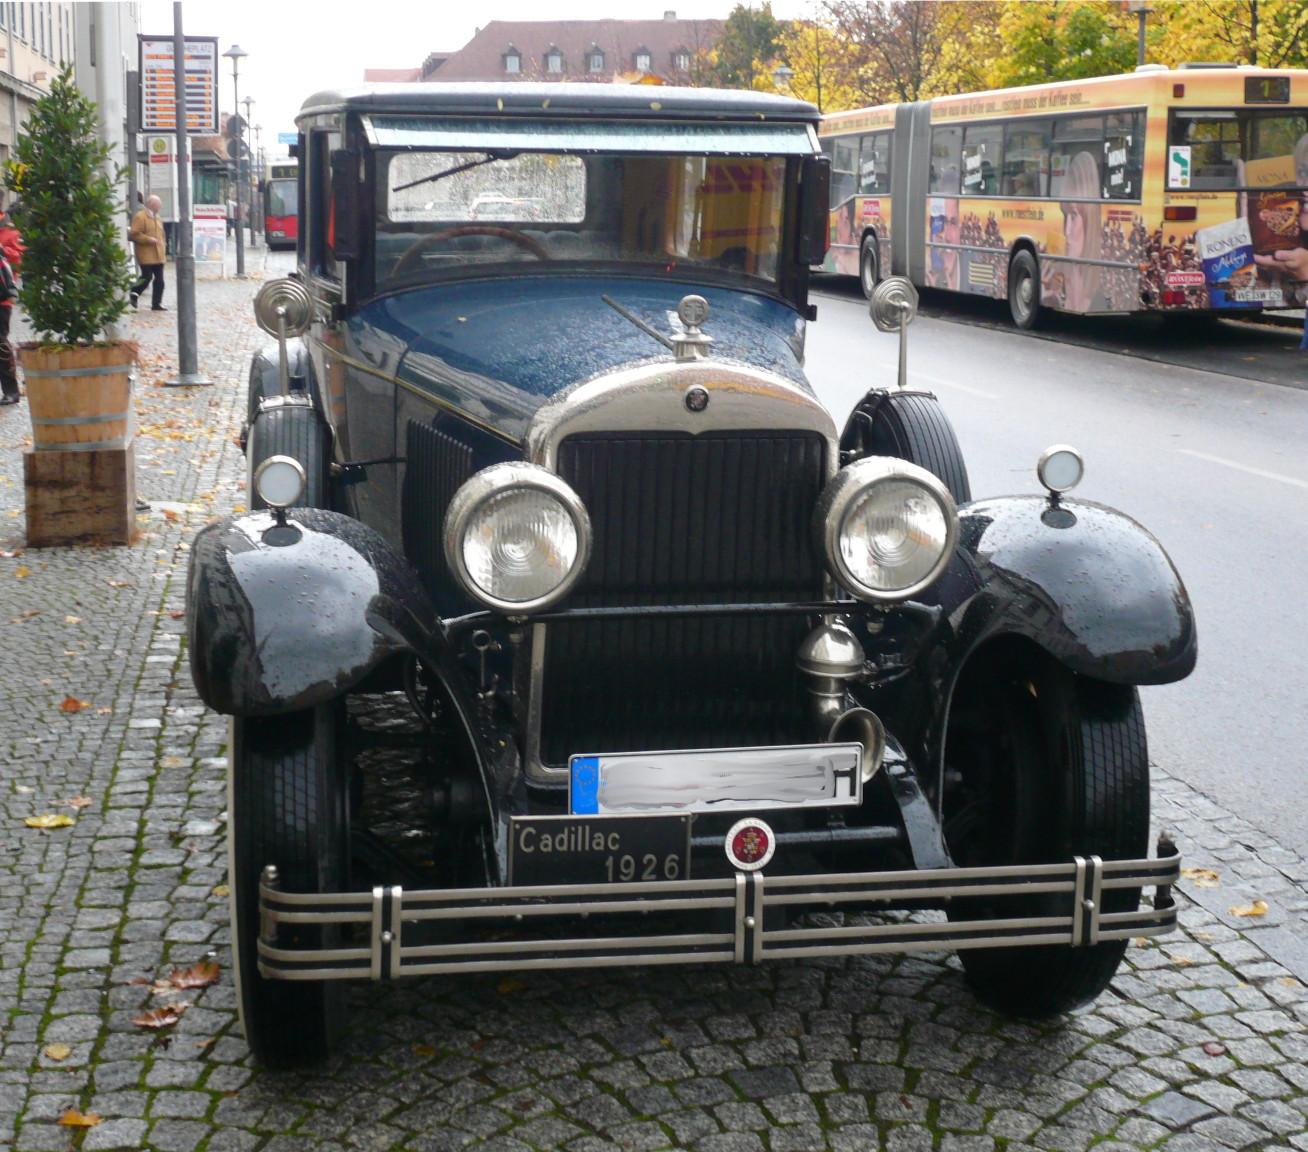 File:Cadillac.Mod314.sedan.front.wmt.jpg